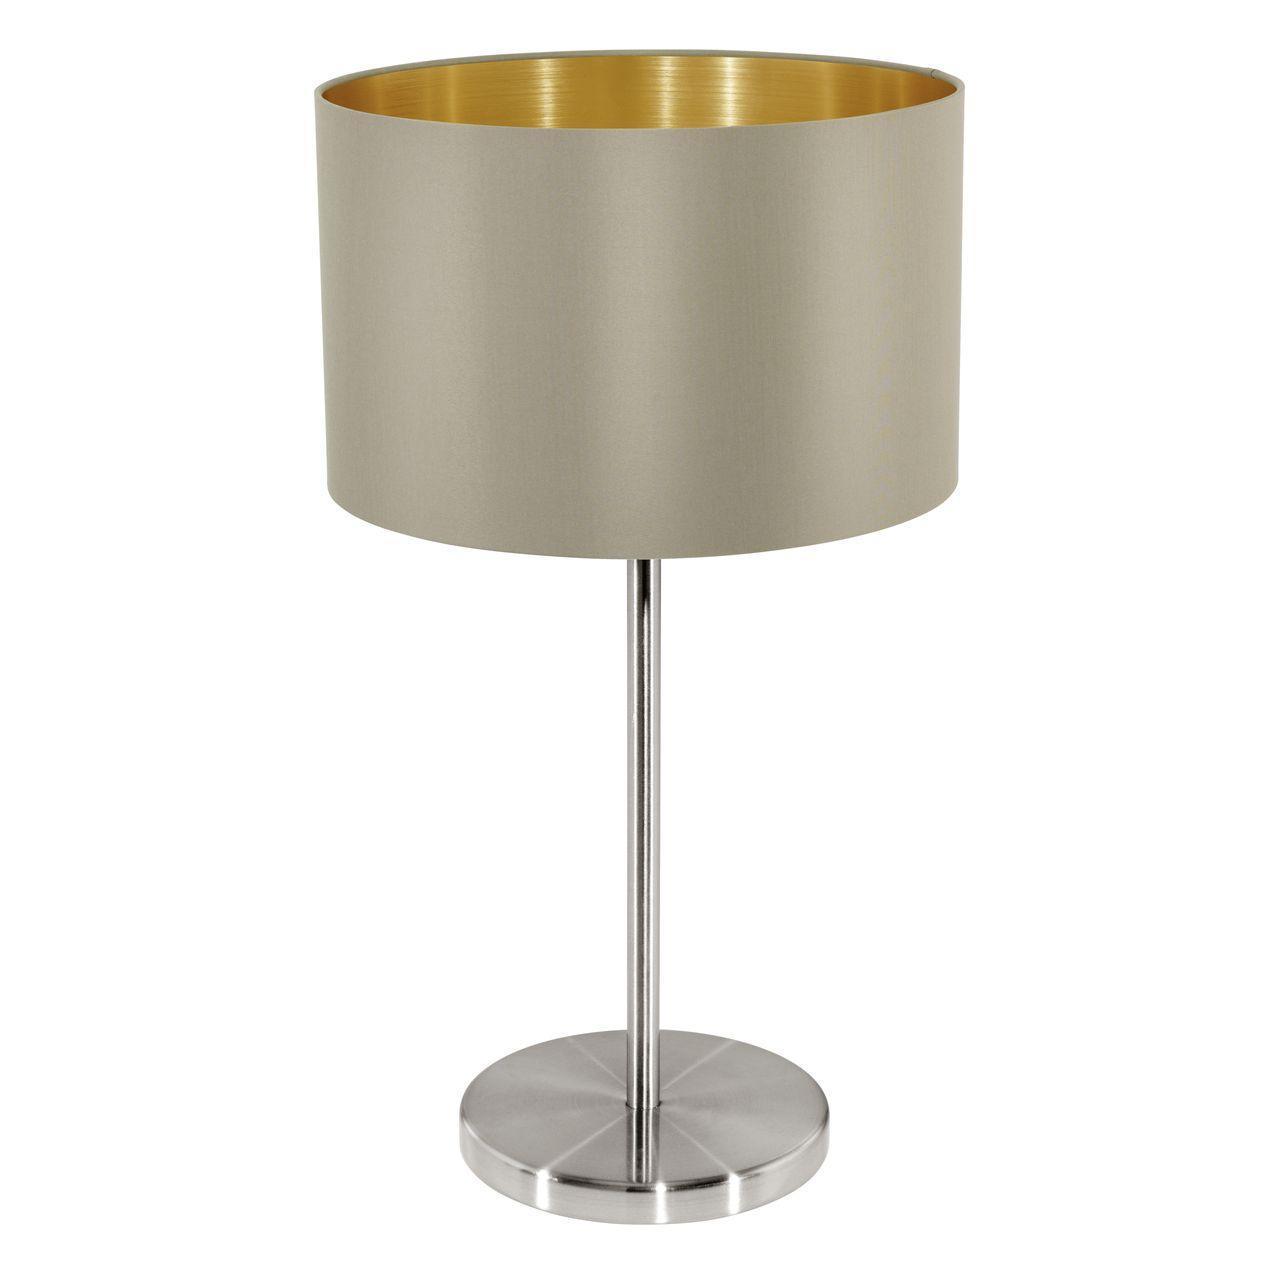 Настольная лампа Eglo Maserlo 31629 eglo настольная лампа декоративная maserlo